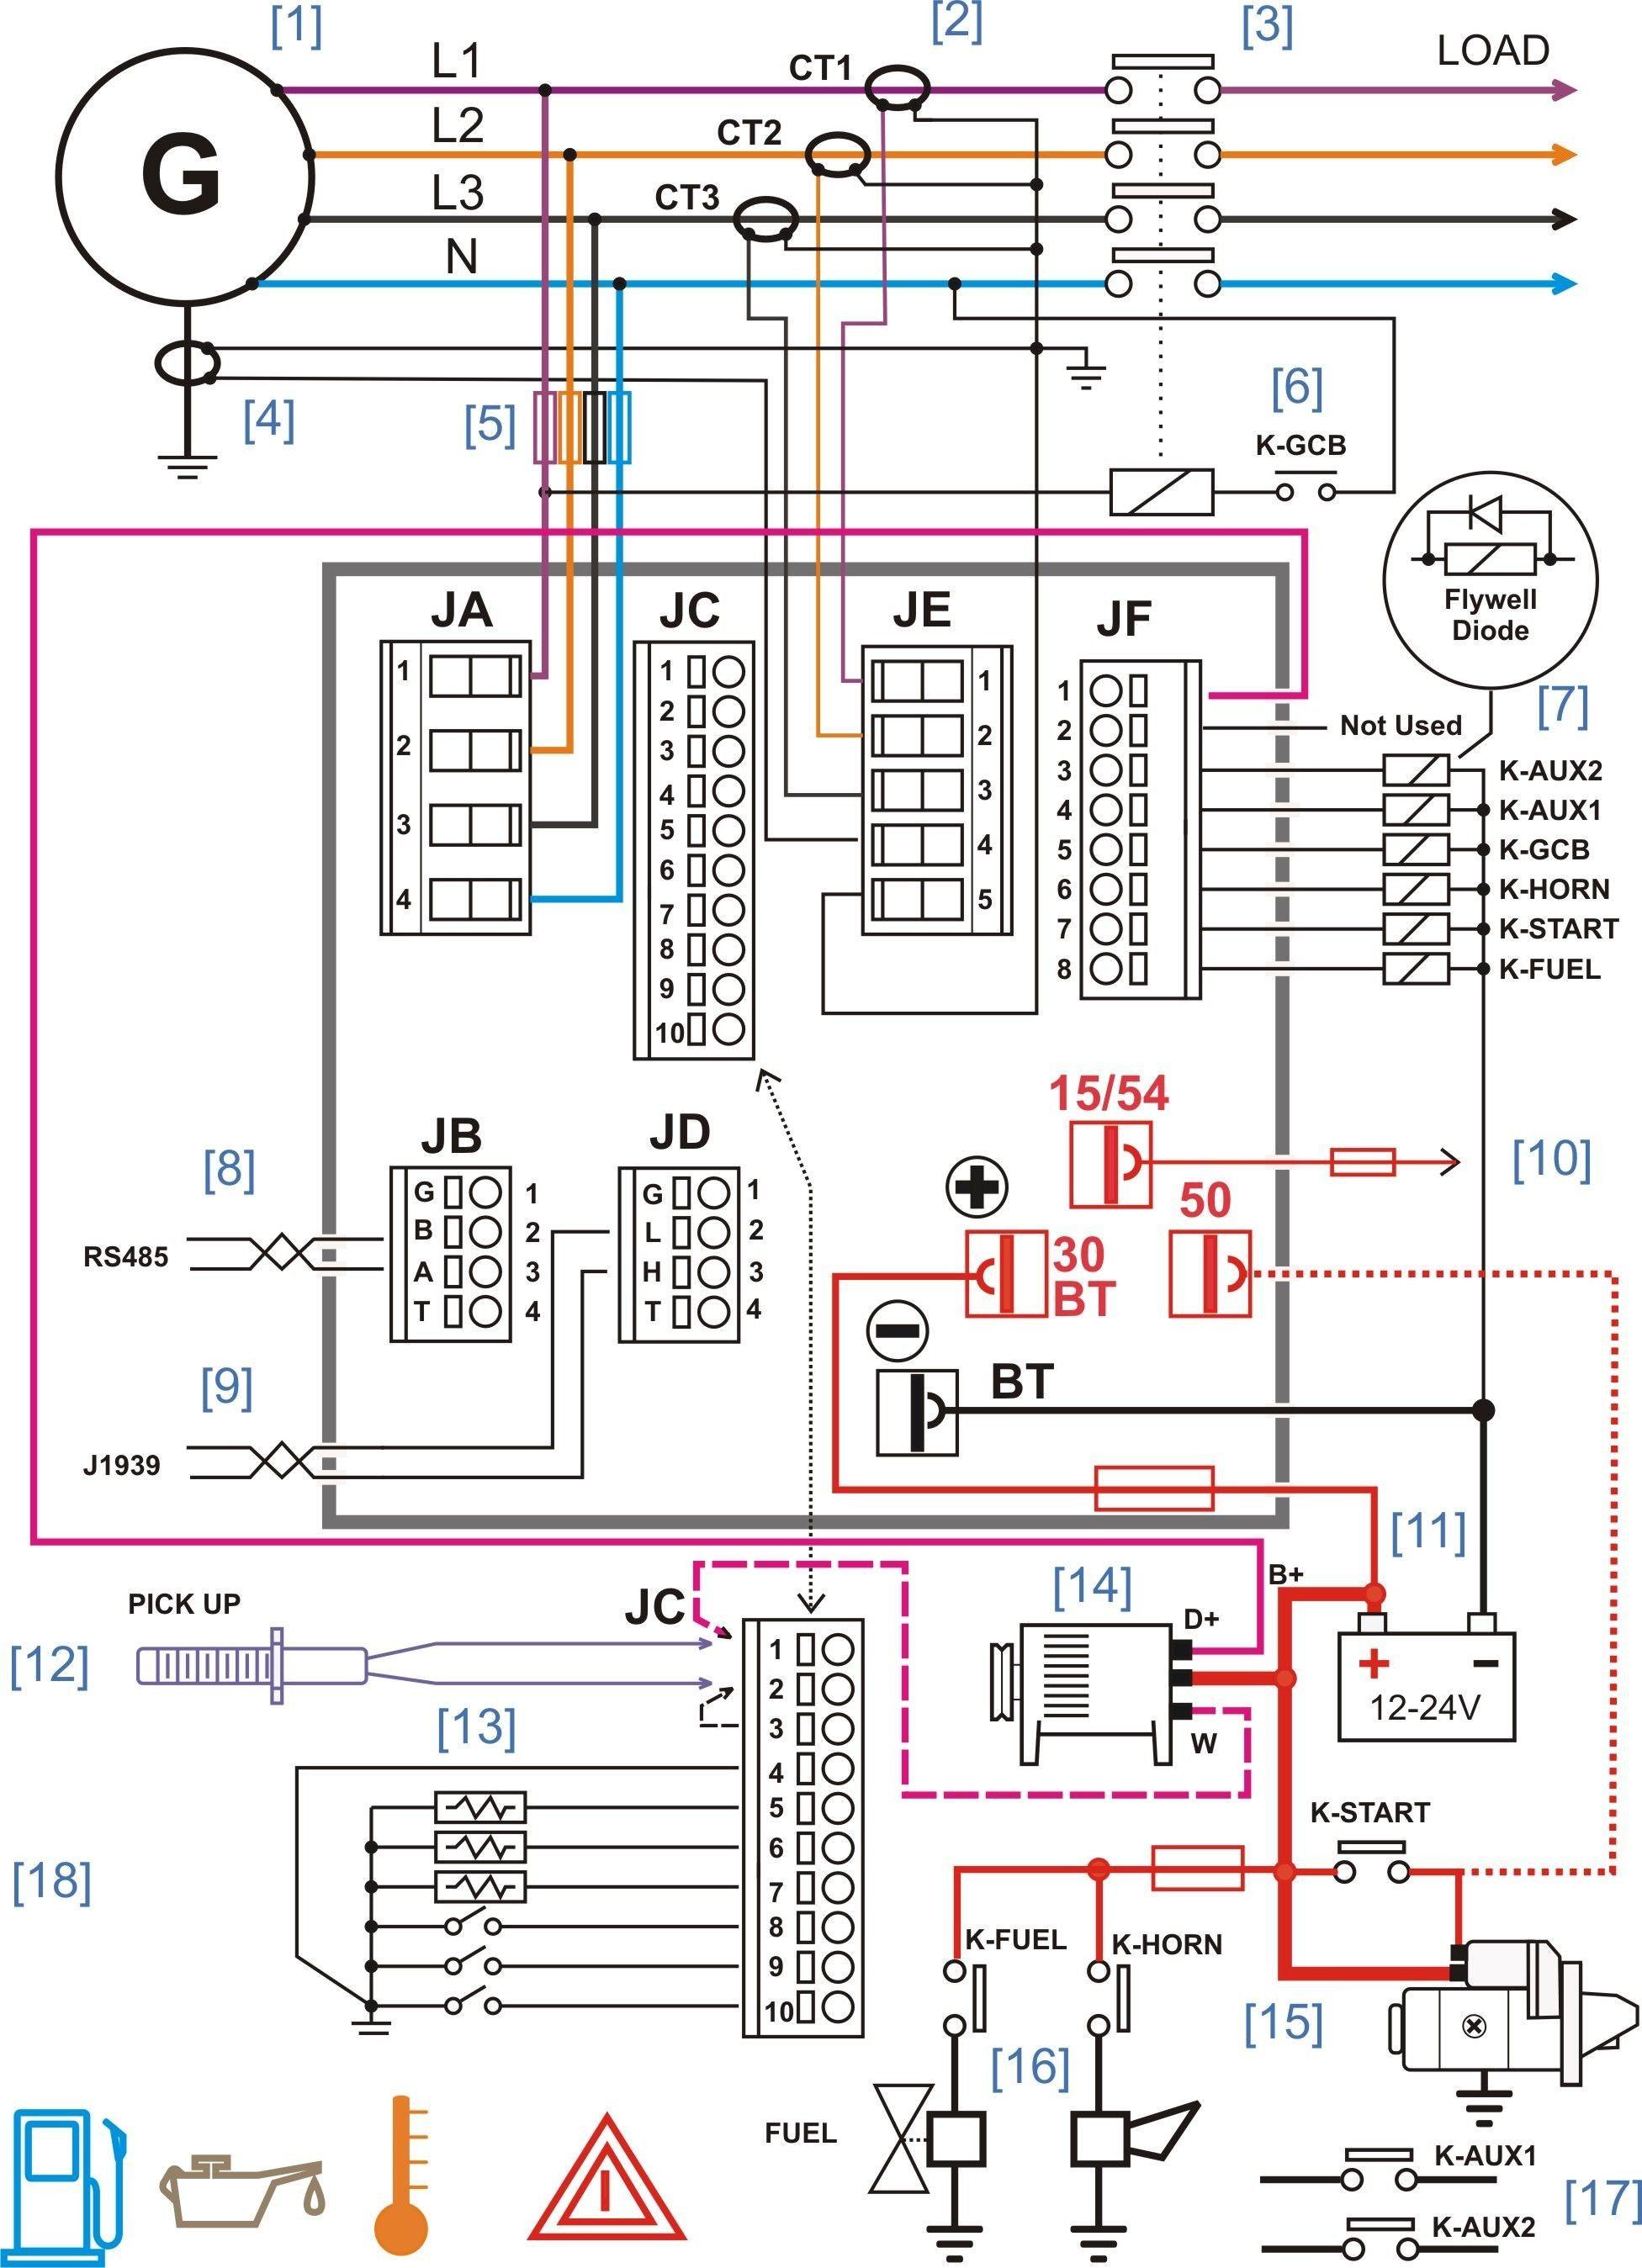 Best Of Building Electrical Wiring Diagram Symbols Diagrams Digramssample Diagramima Electrical Circuit Diagram Electrical Diagram Electrical Wiring Diagram